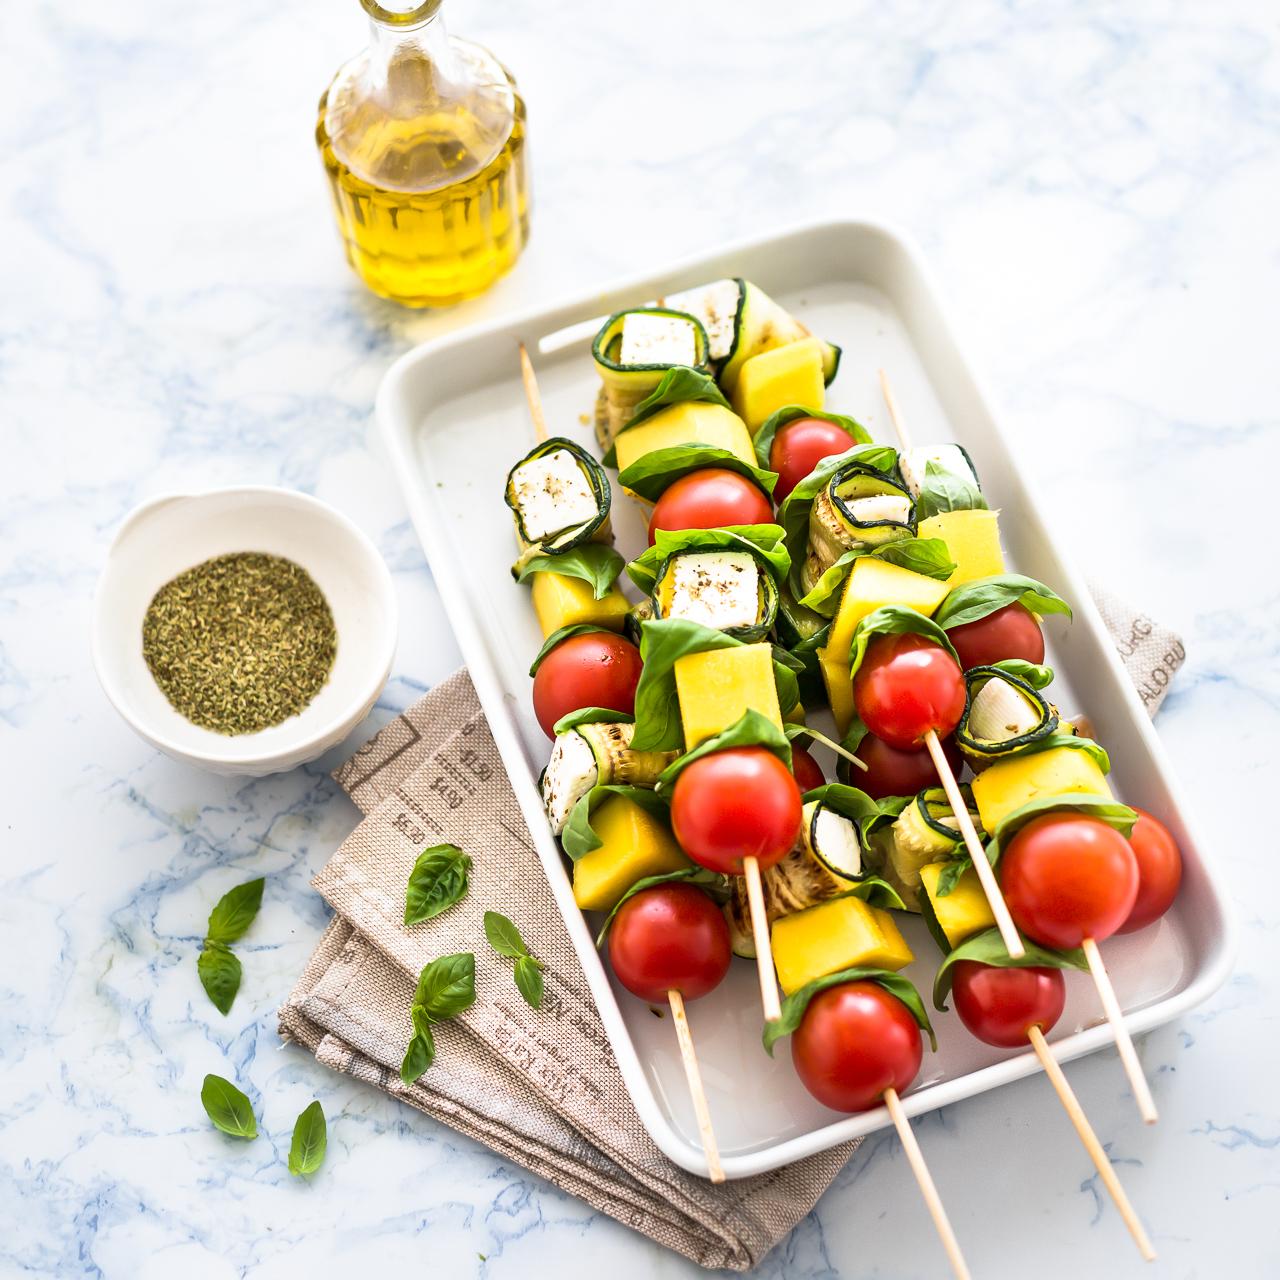 spiedini di zucchine e primosale - spiedini di zucchine - spiedini di verdure - spiedini con primosale - vegetable skewers - vegetable kabobs - vegetable kebabs - food photography - food styling - opsd blog